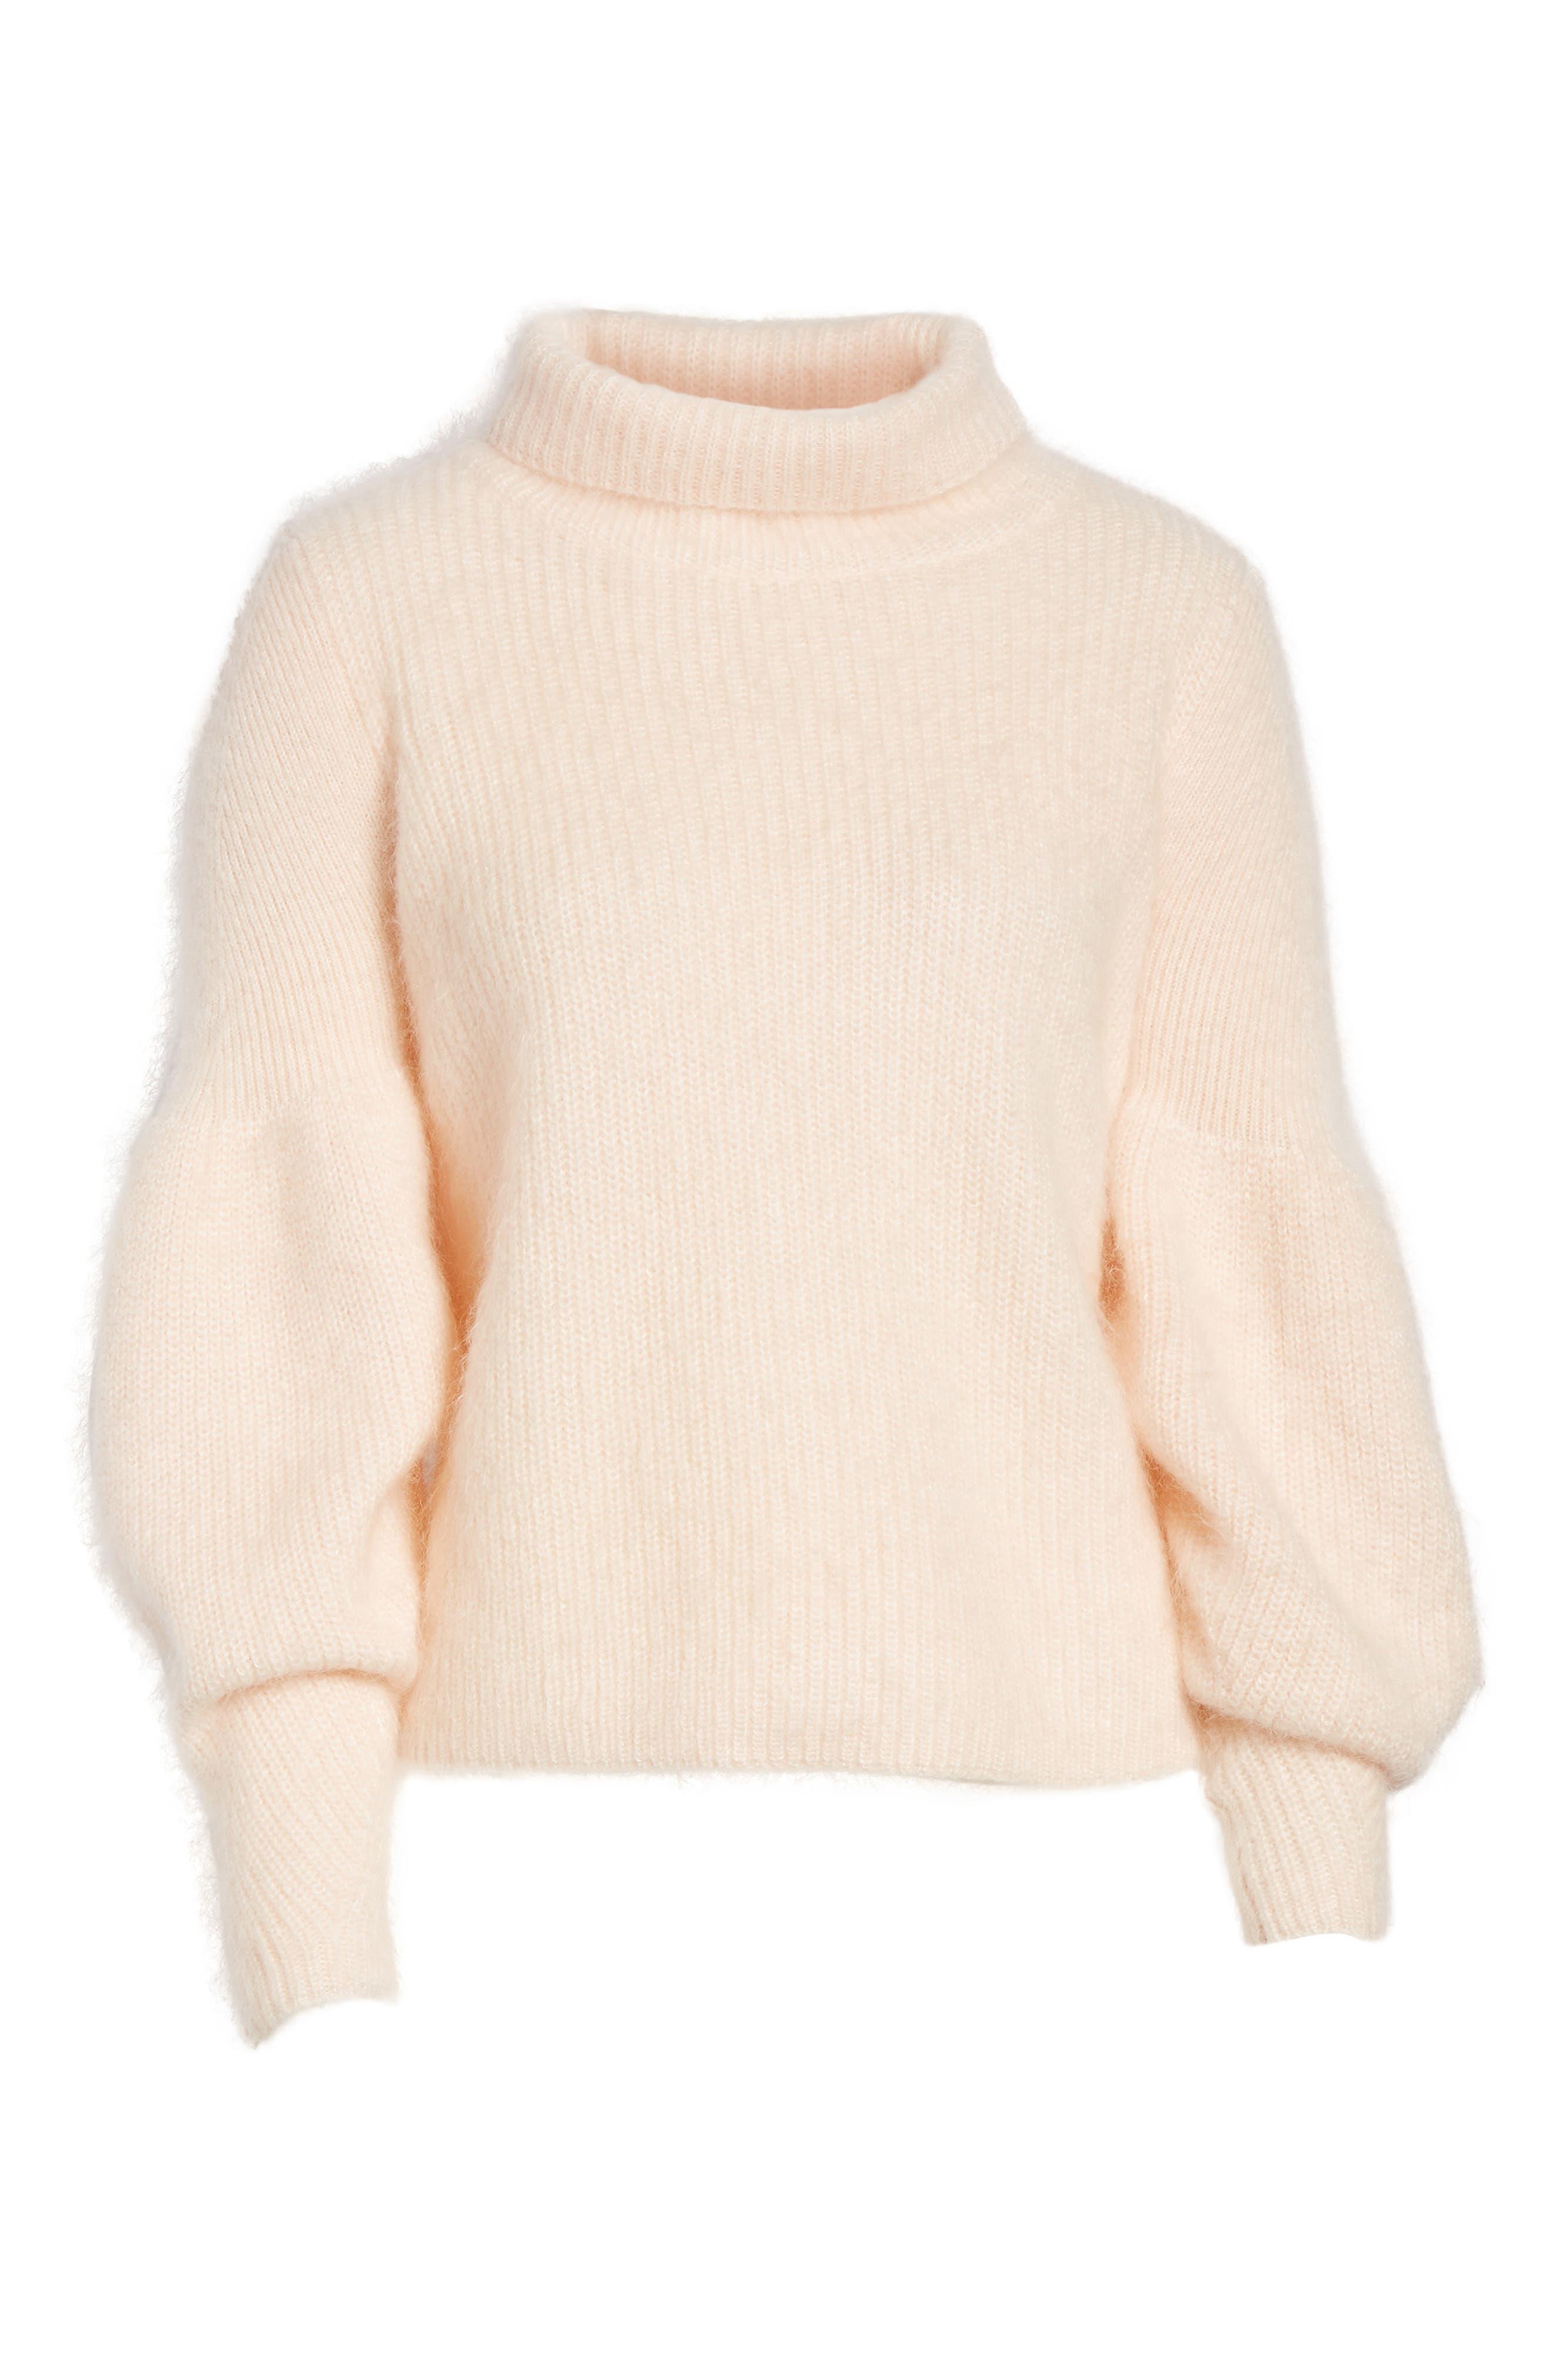 Poet Sleeve Sweater,                             Alternate thumbnail 6, color,                             680